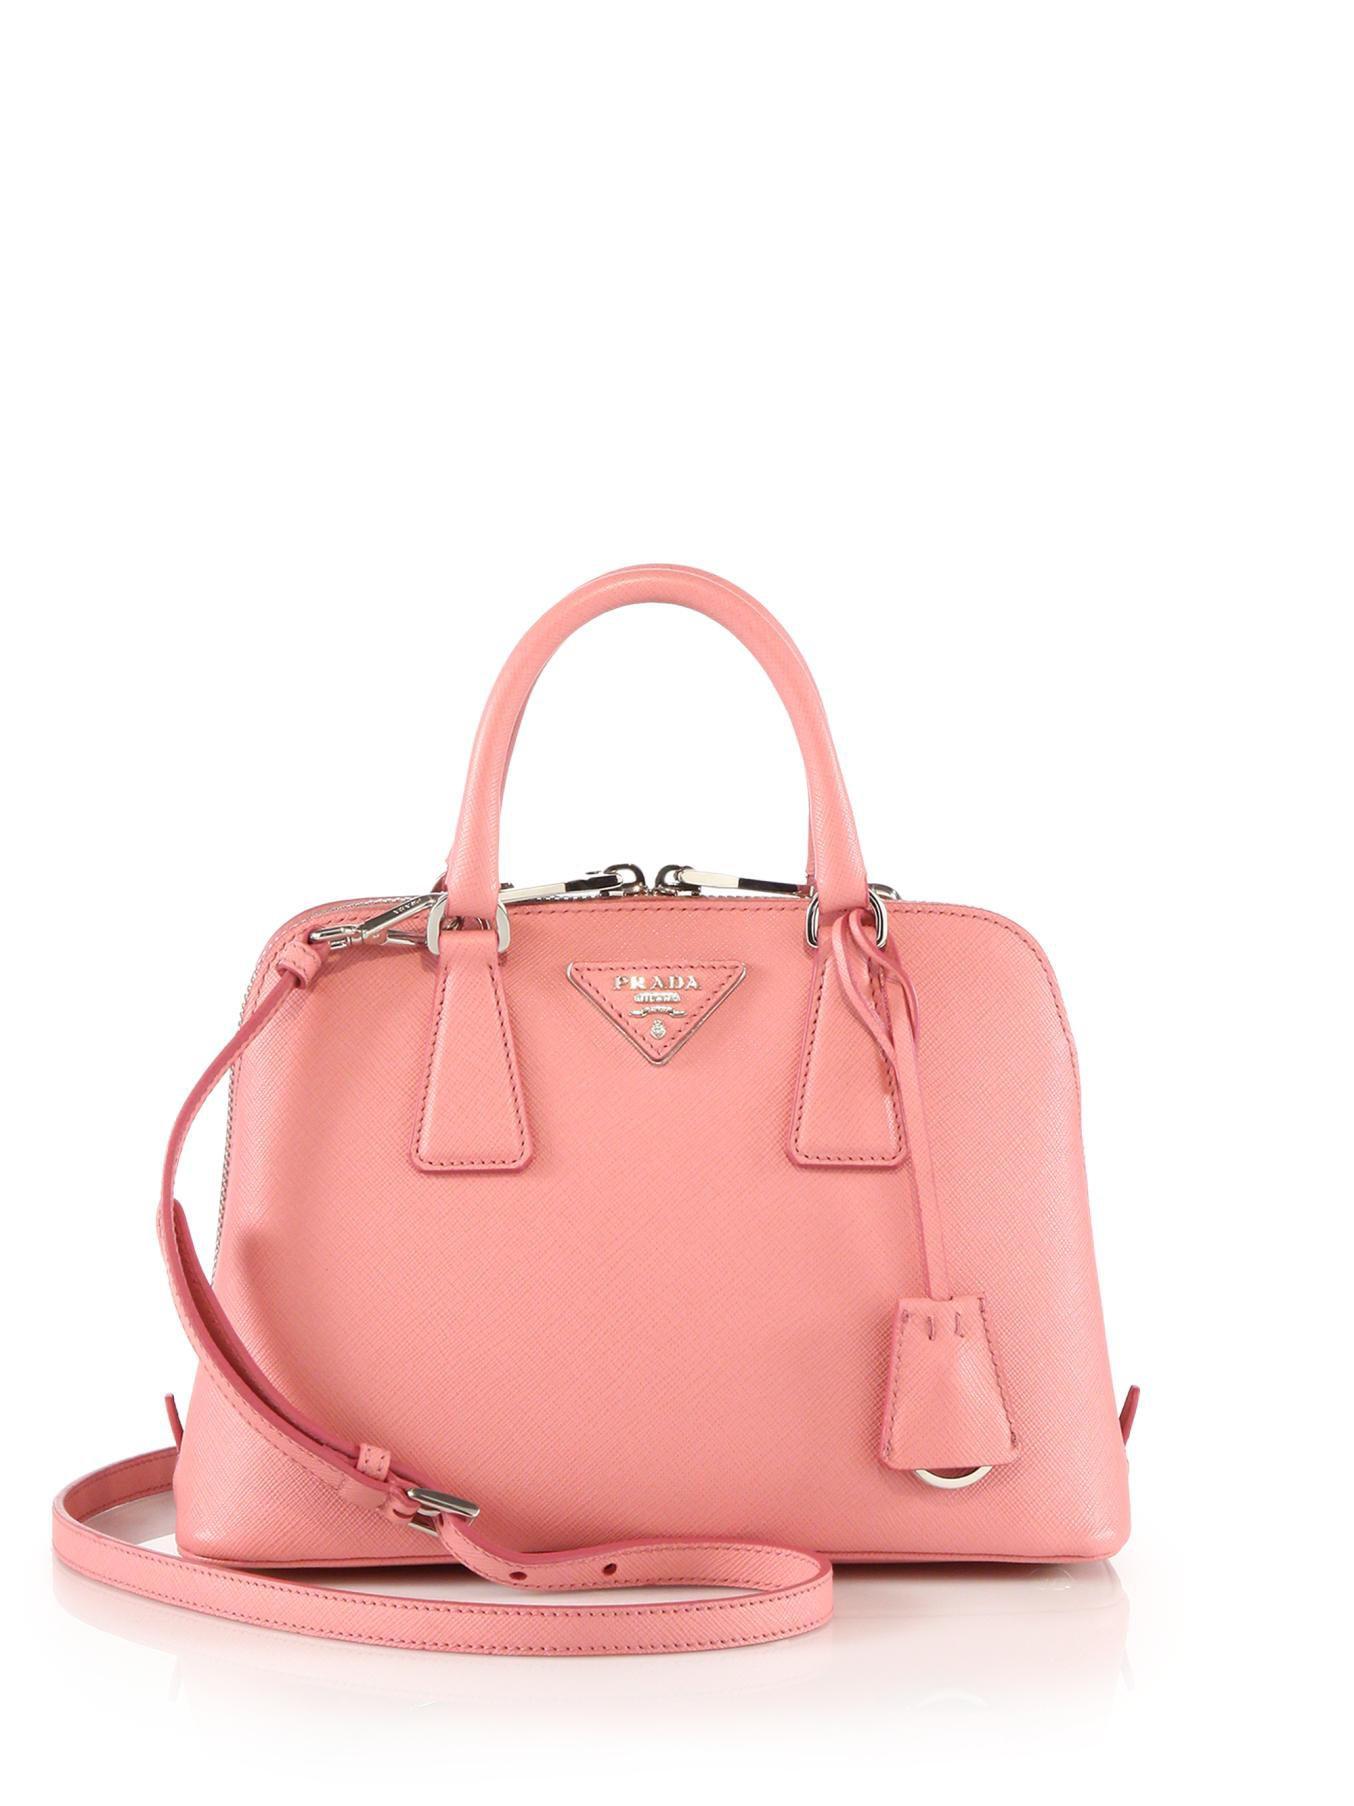 Prada Mini Saffiano Leather Shoulder Bag in Pink (petalo) | Lyst